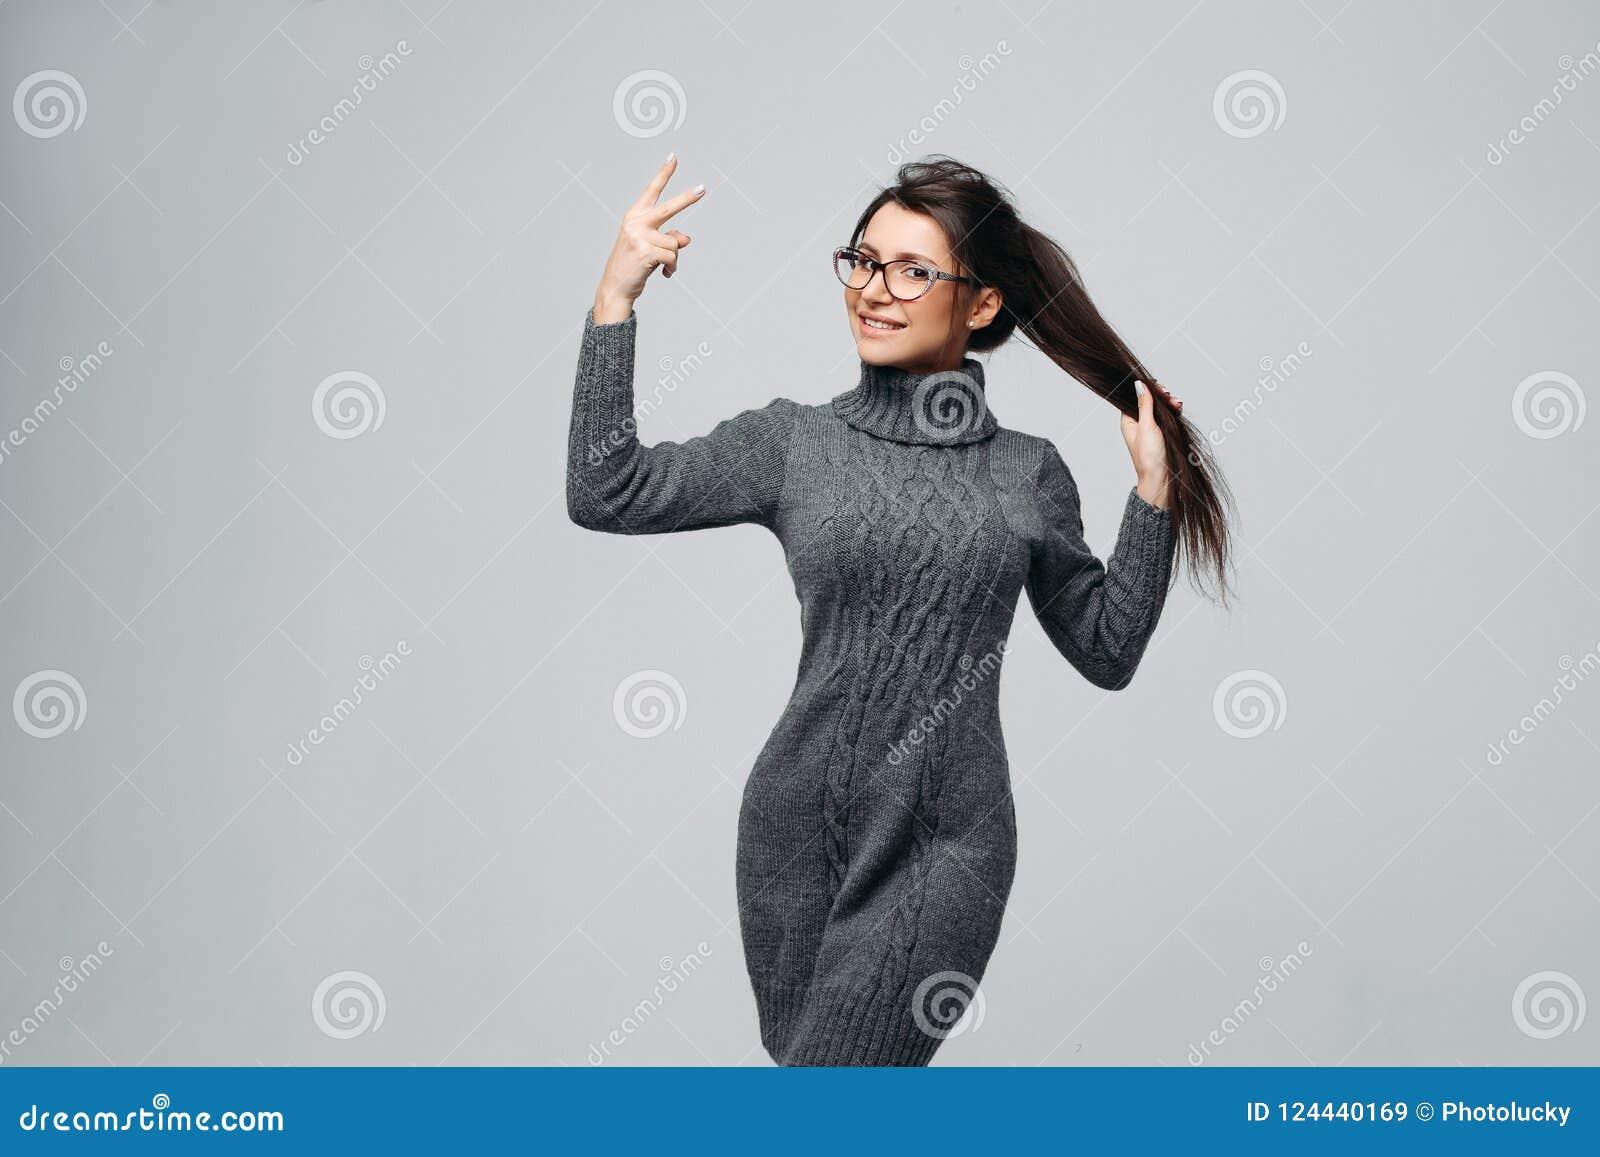 9b5b8cb3245 Stylish pretty girl posing at studio in fashionable dress. Isolated on gray  background